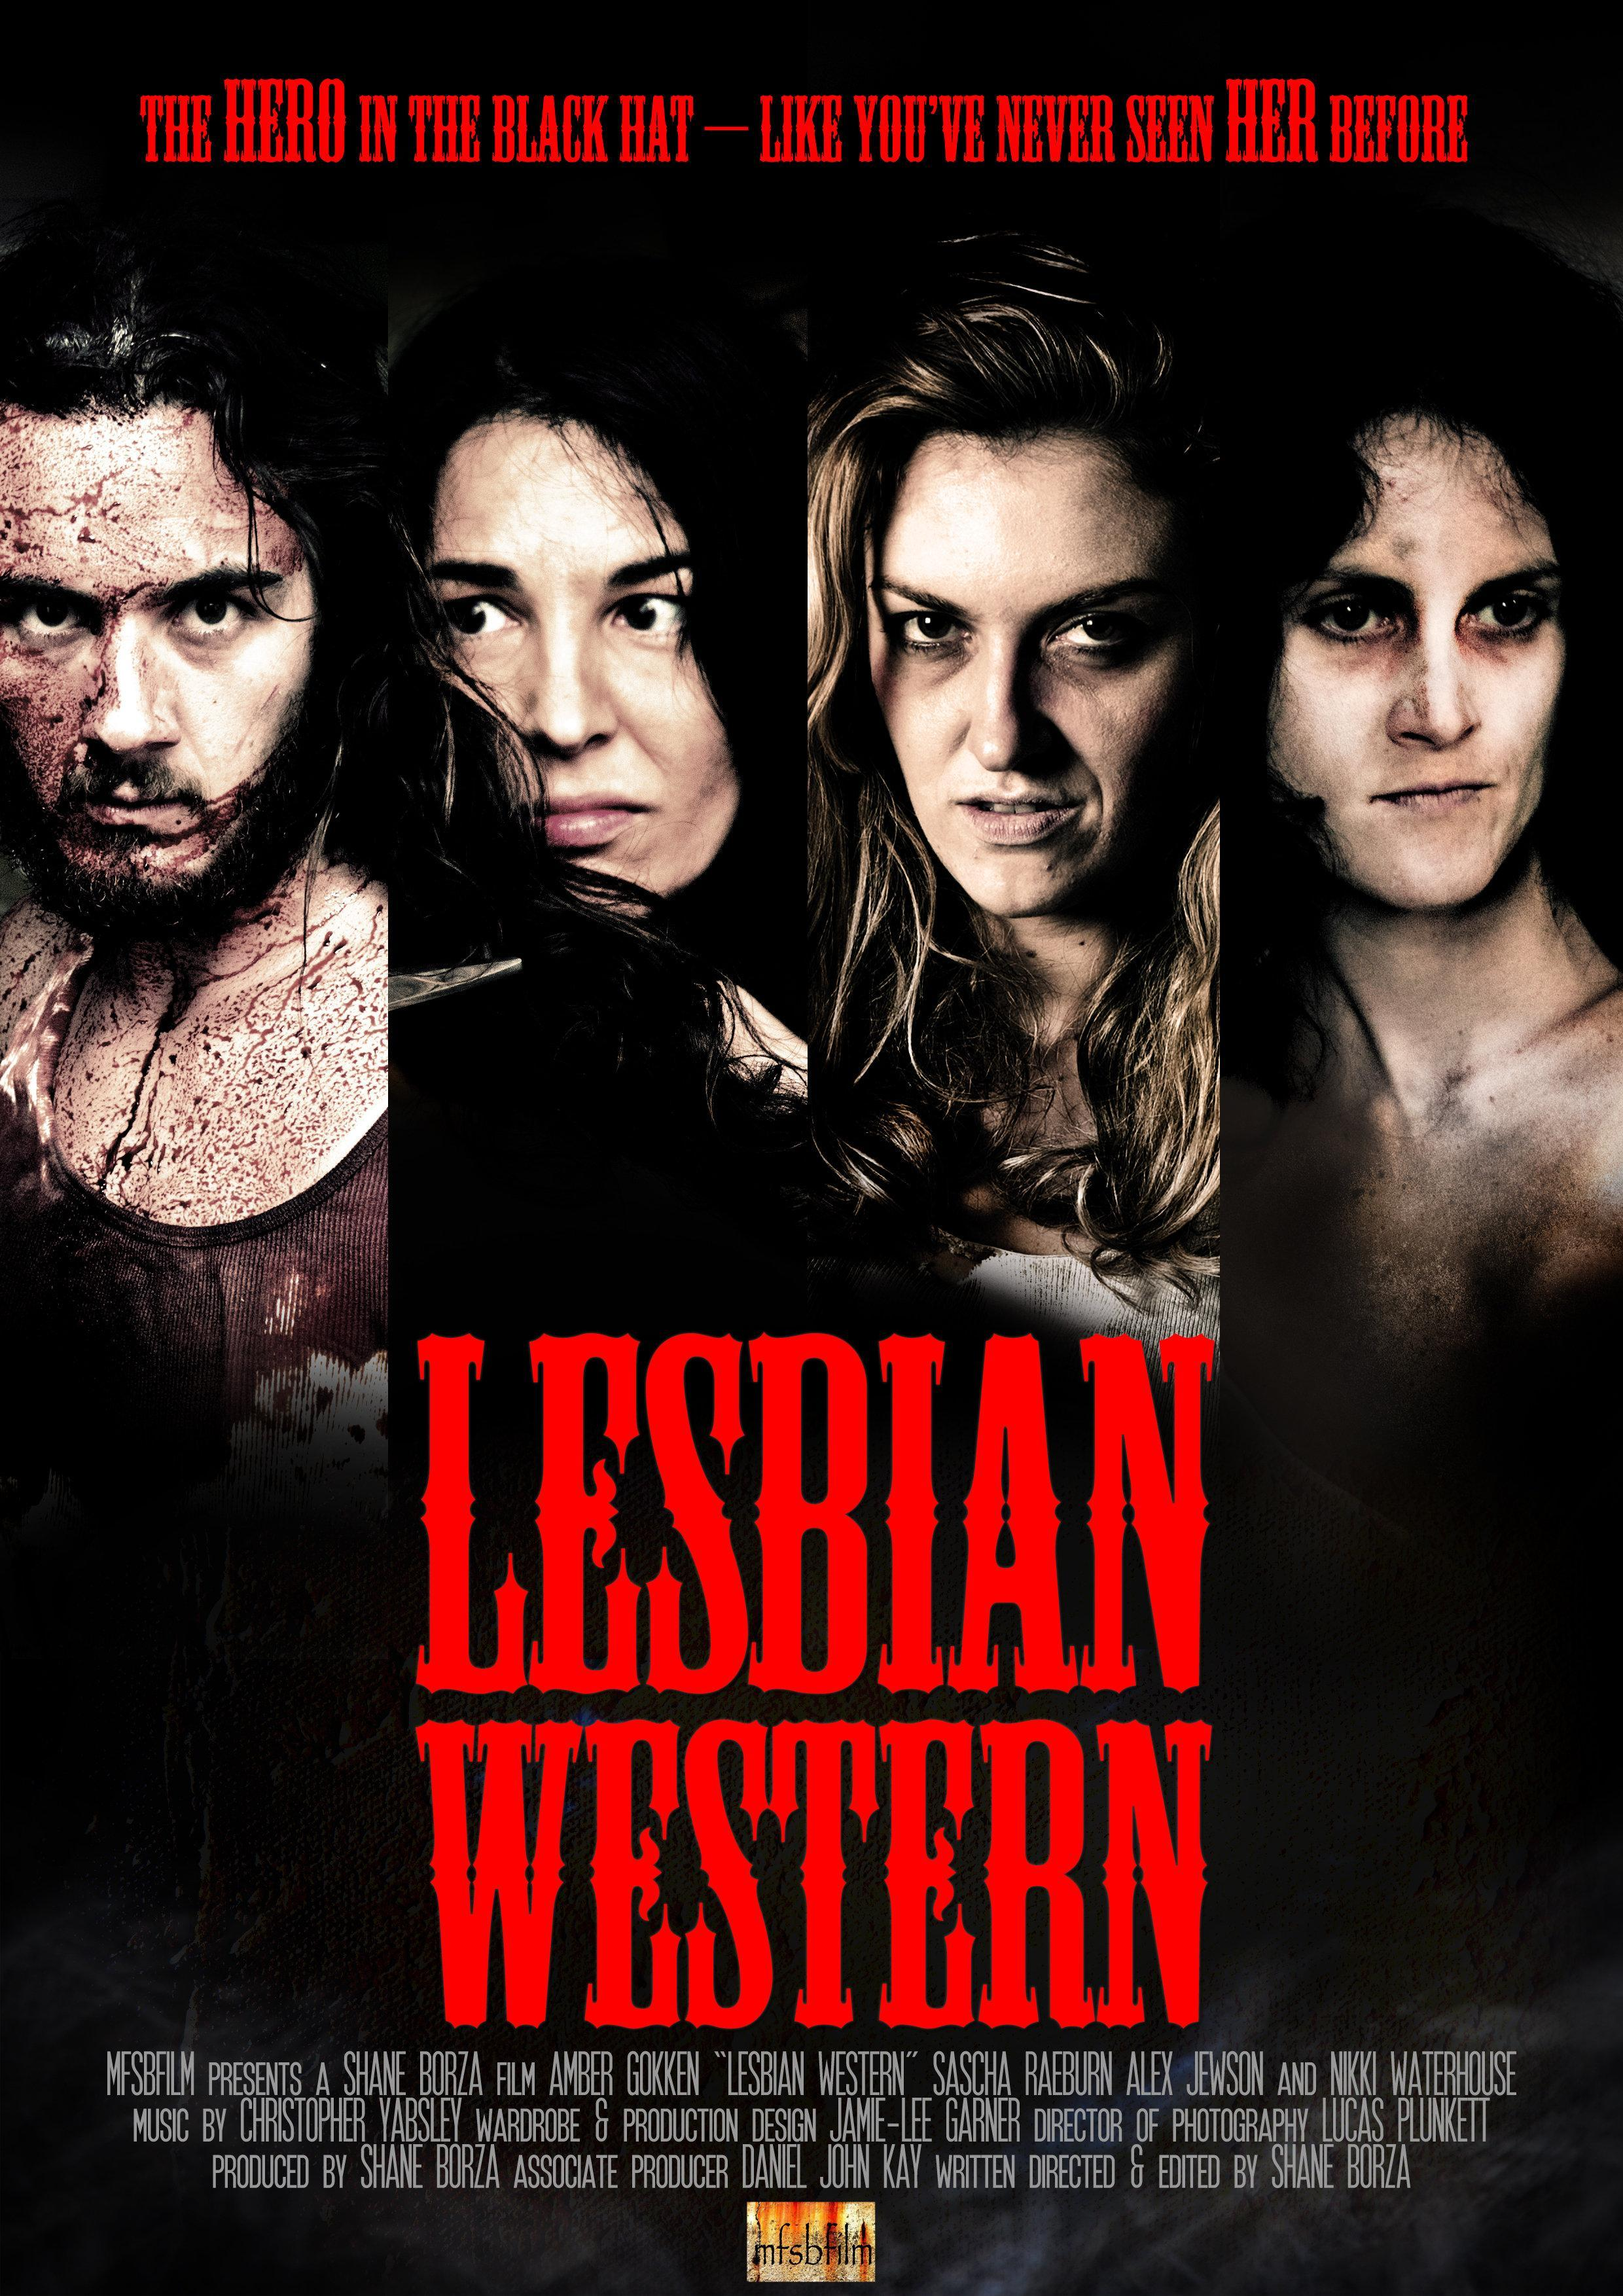 Lesbian action film